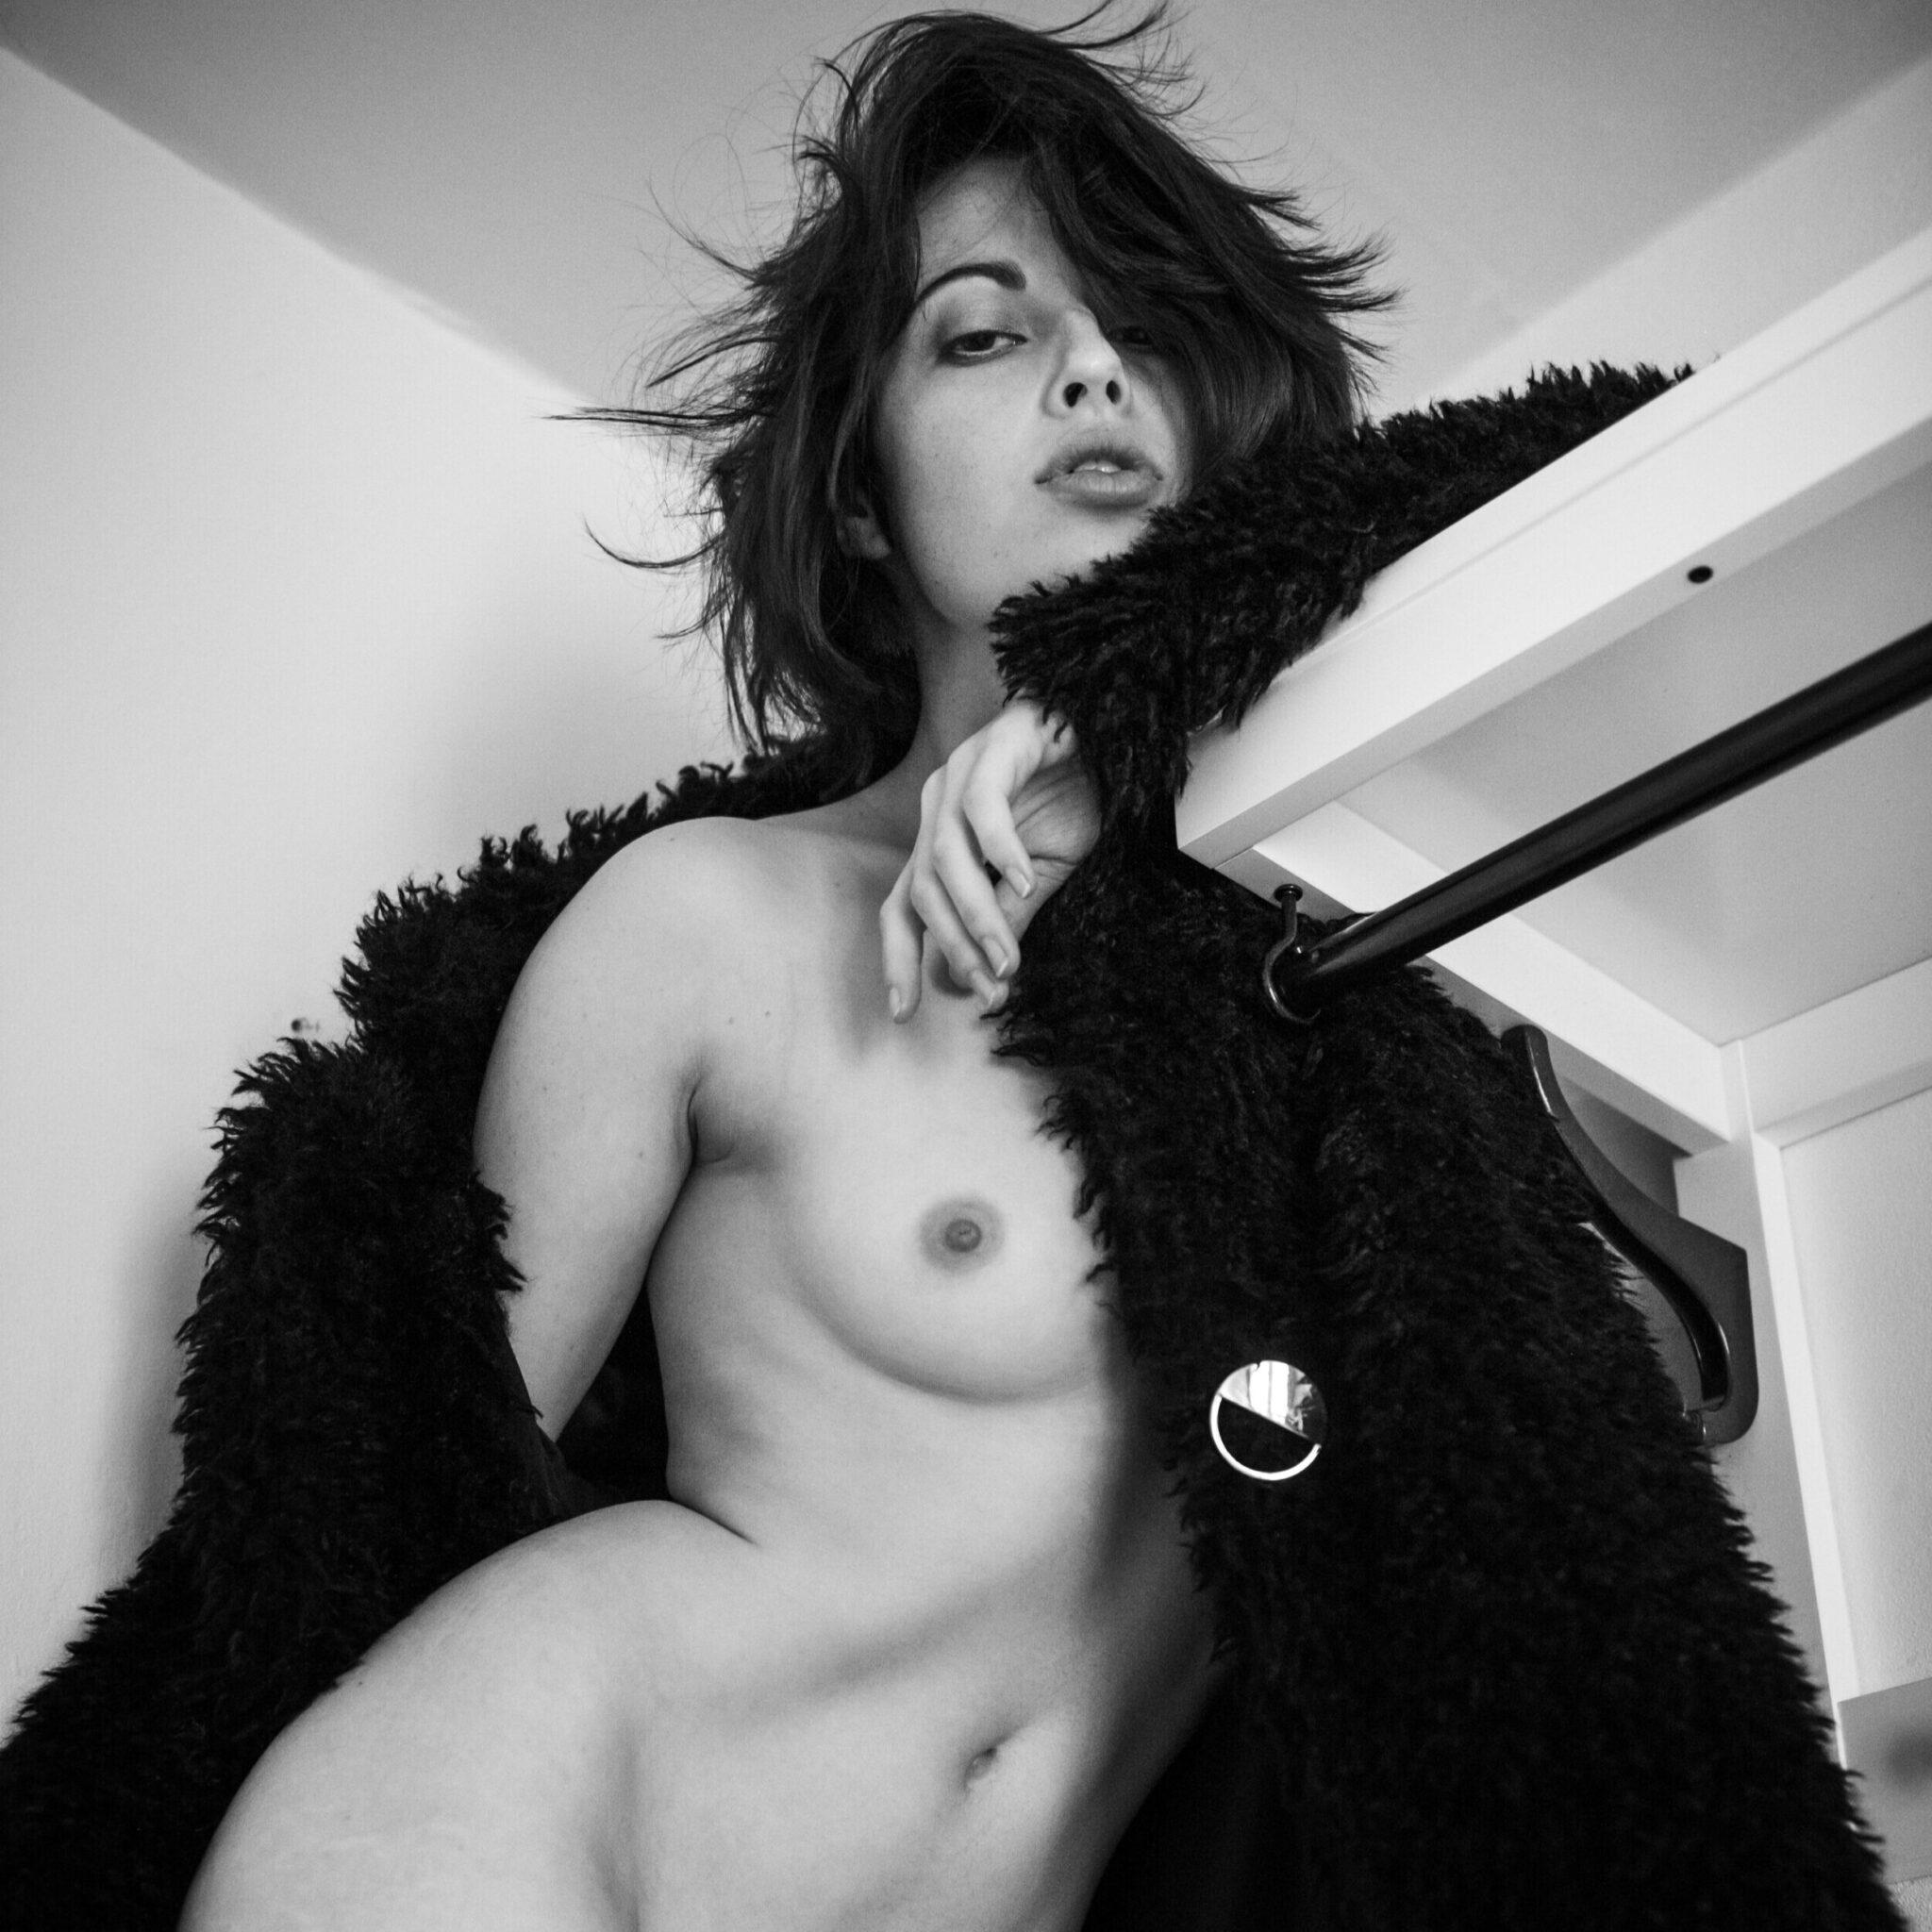 Juliette Alenvers - Jude P photoshoot